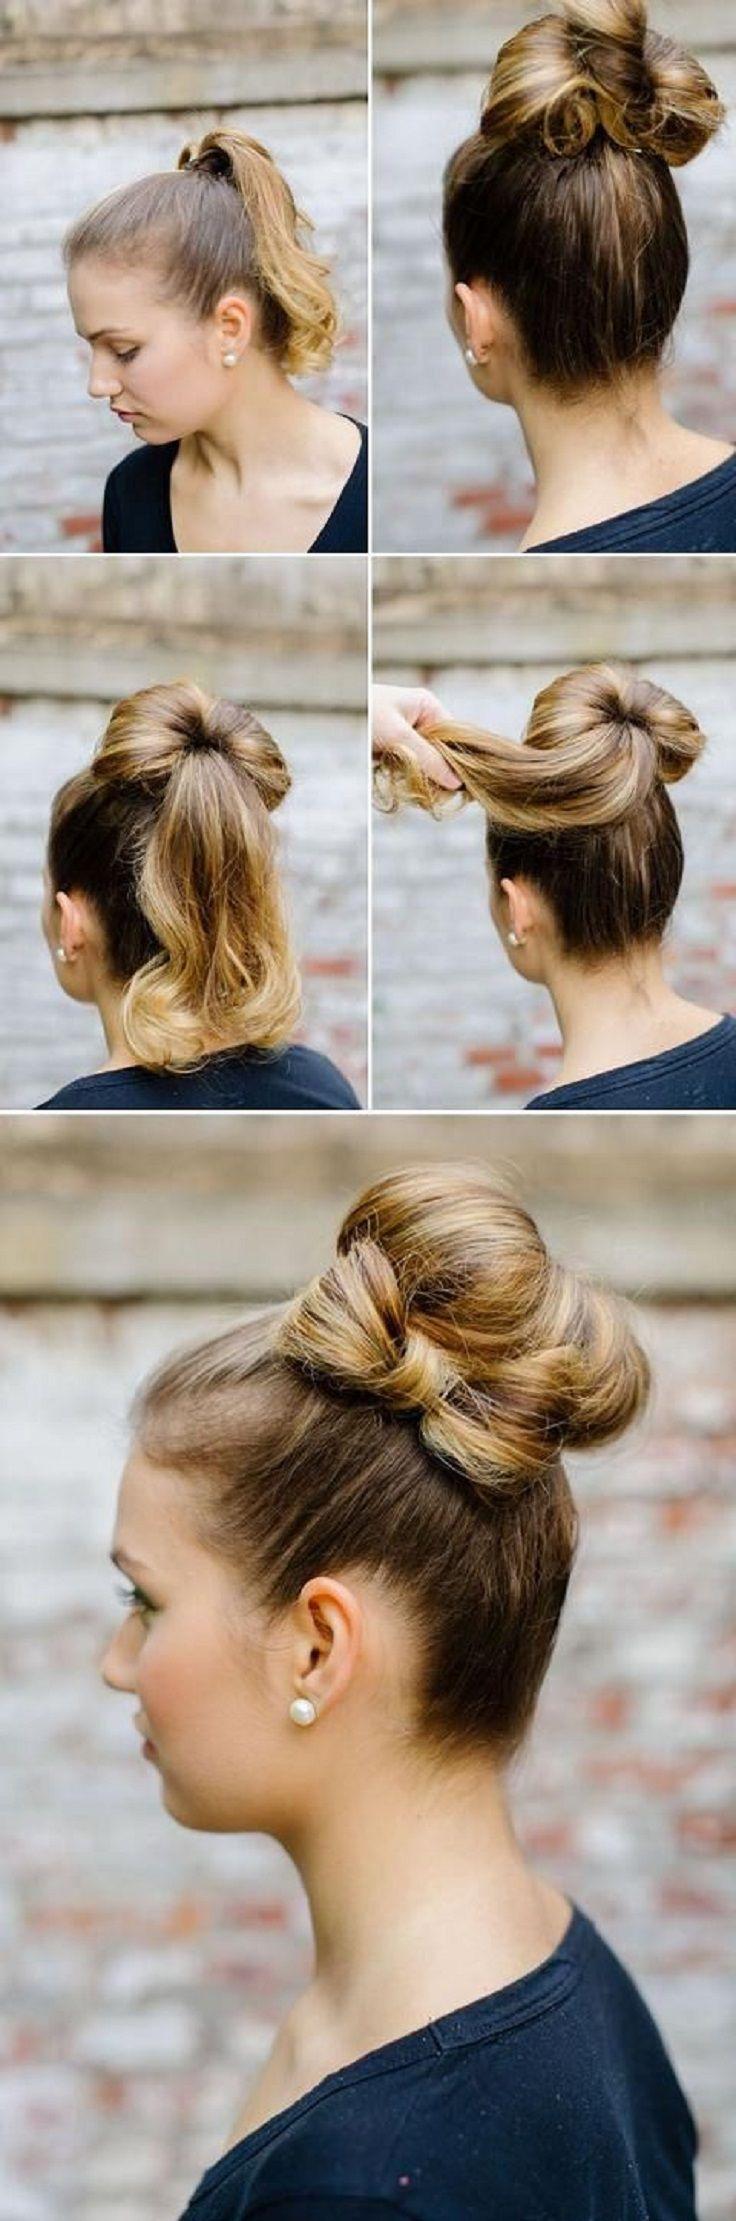 #HairStyle #Turorial